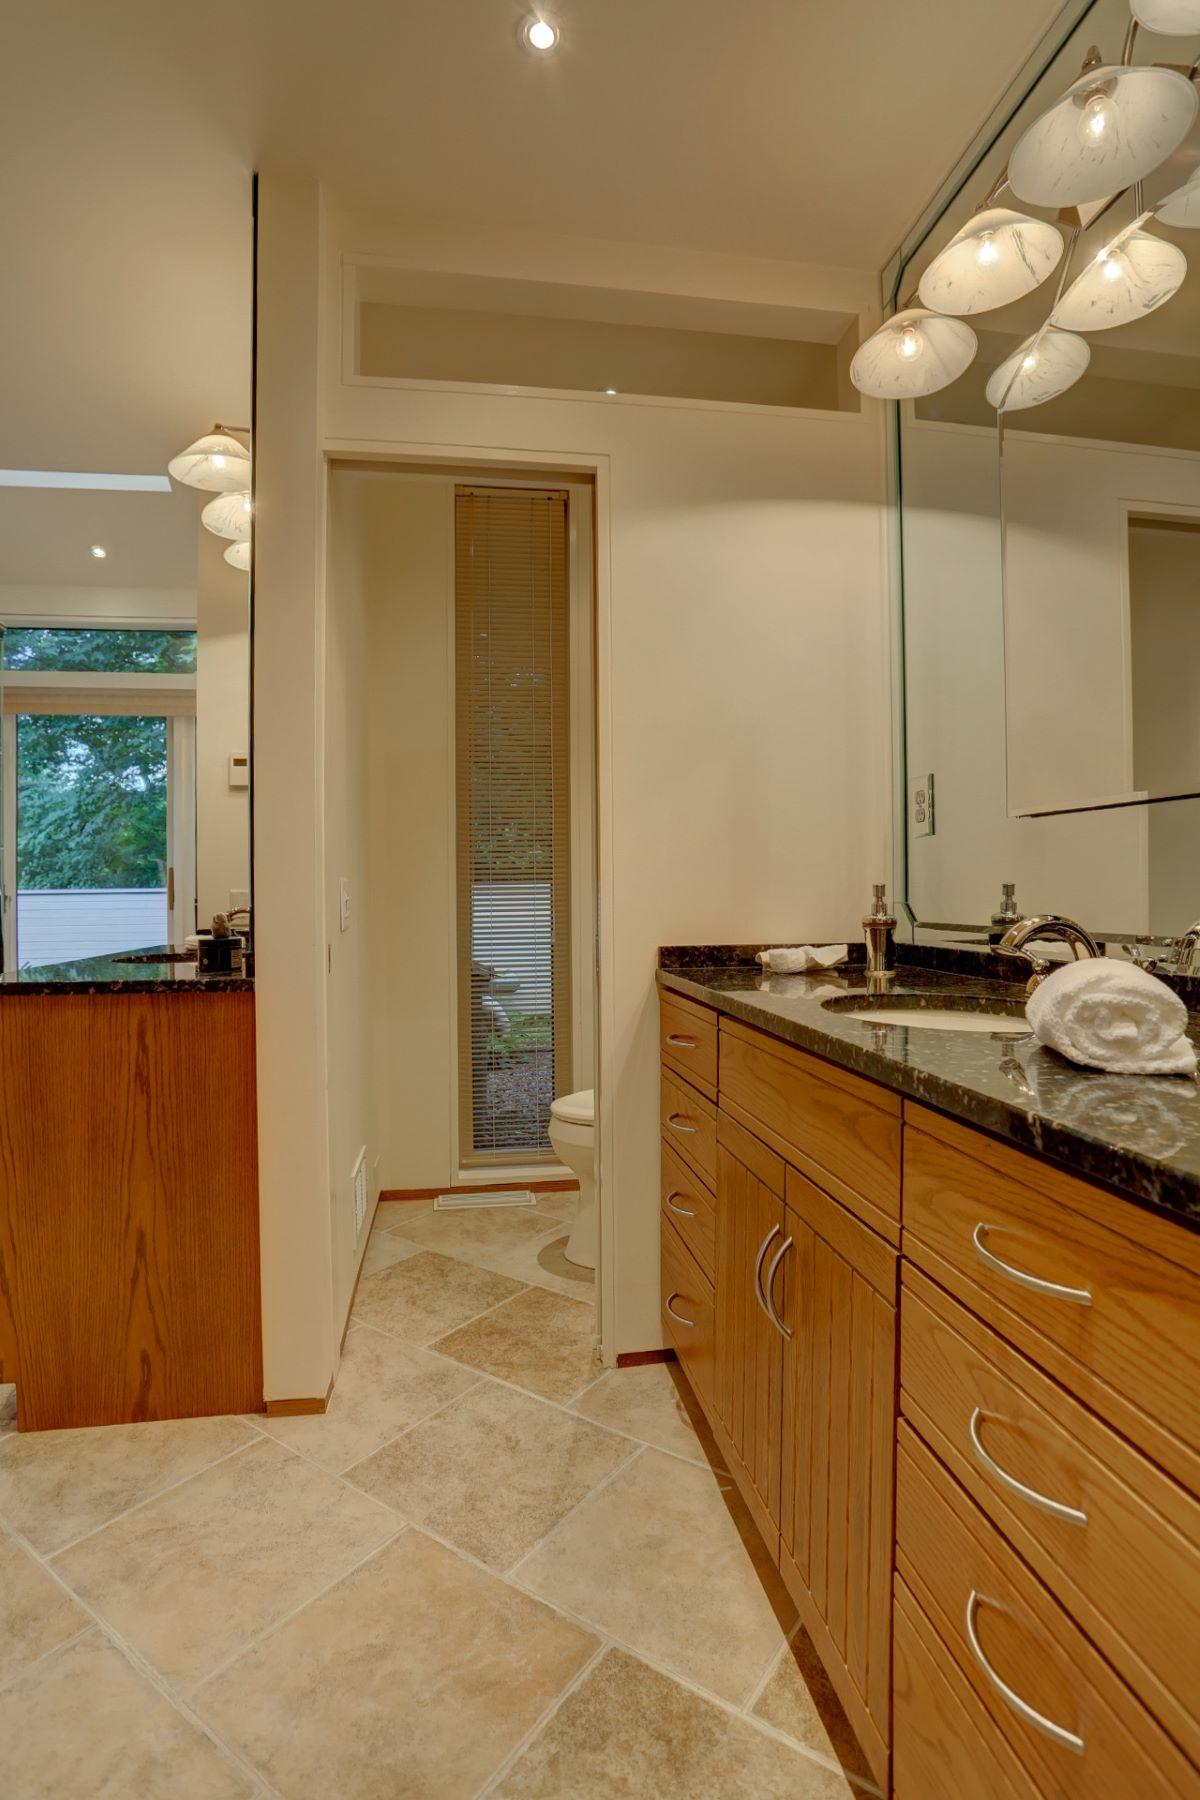 Additional photo for property listing at 193 Eshelman Road  Lancaster, Pennsylvania 17601 United States